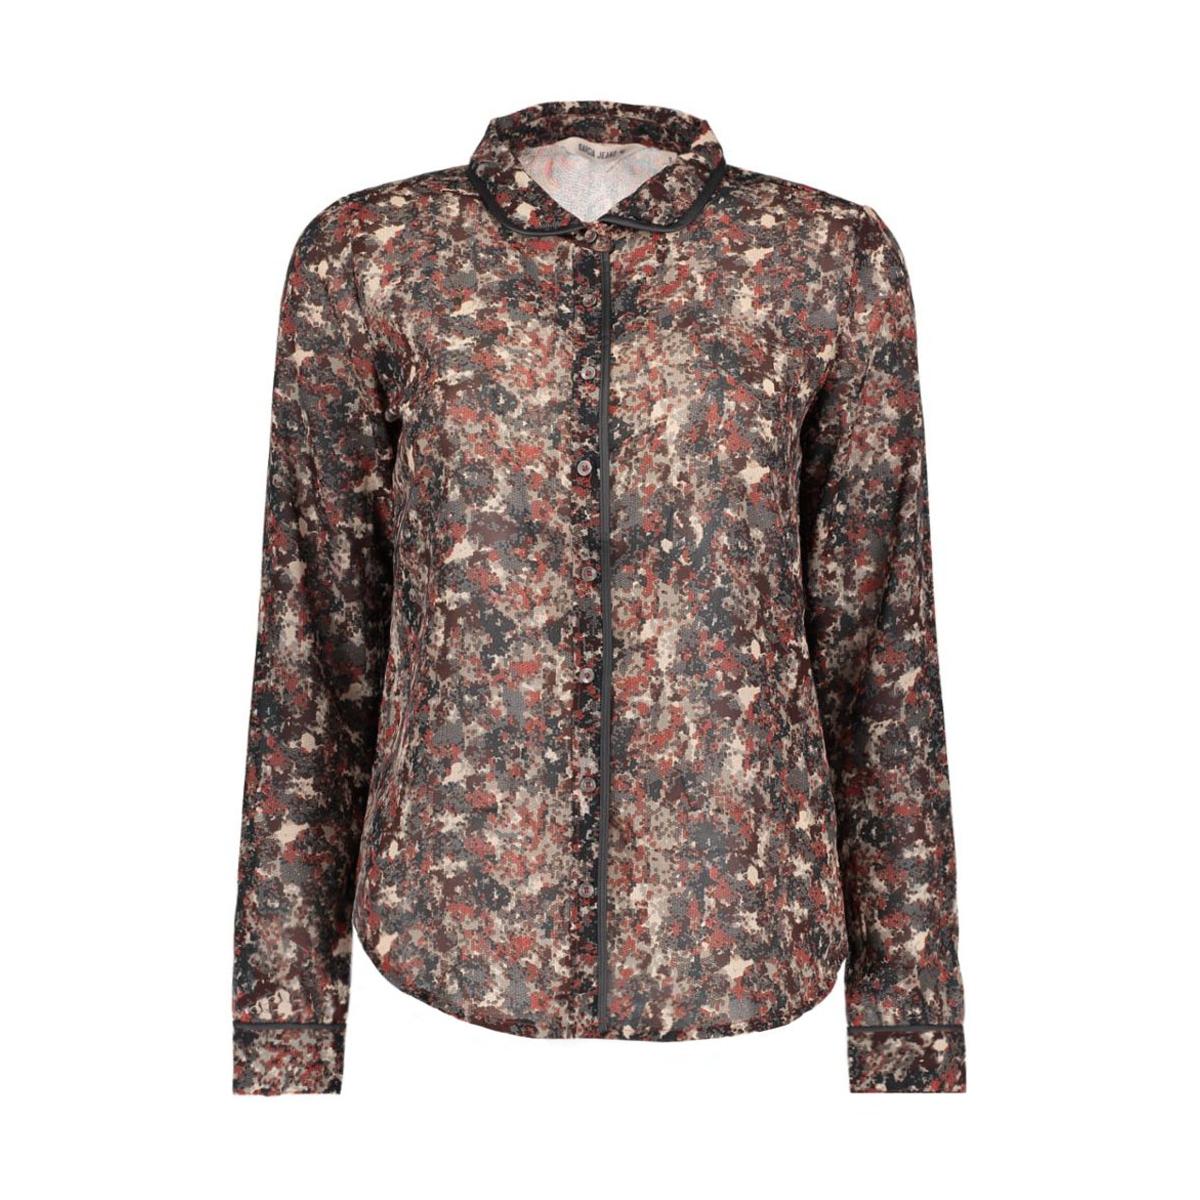 v60235 garcia blouse 2051 brique